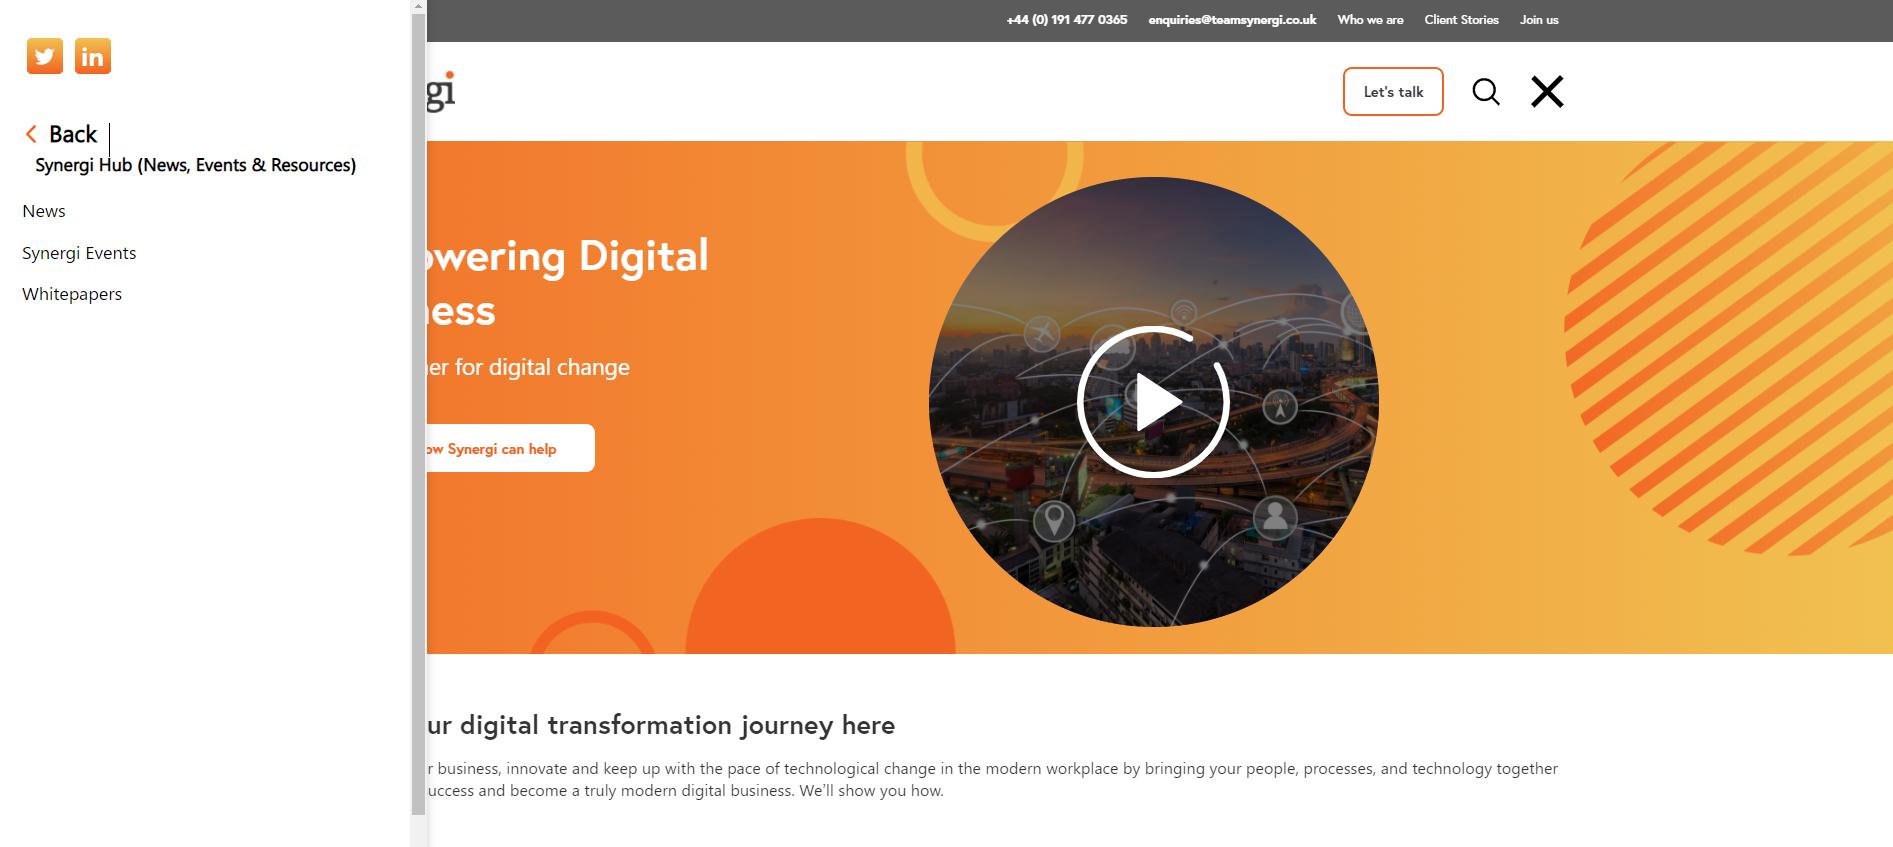 Screenshot 2021-03-18 112510-Synergi launches on-demand webinar access